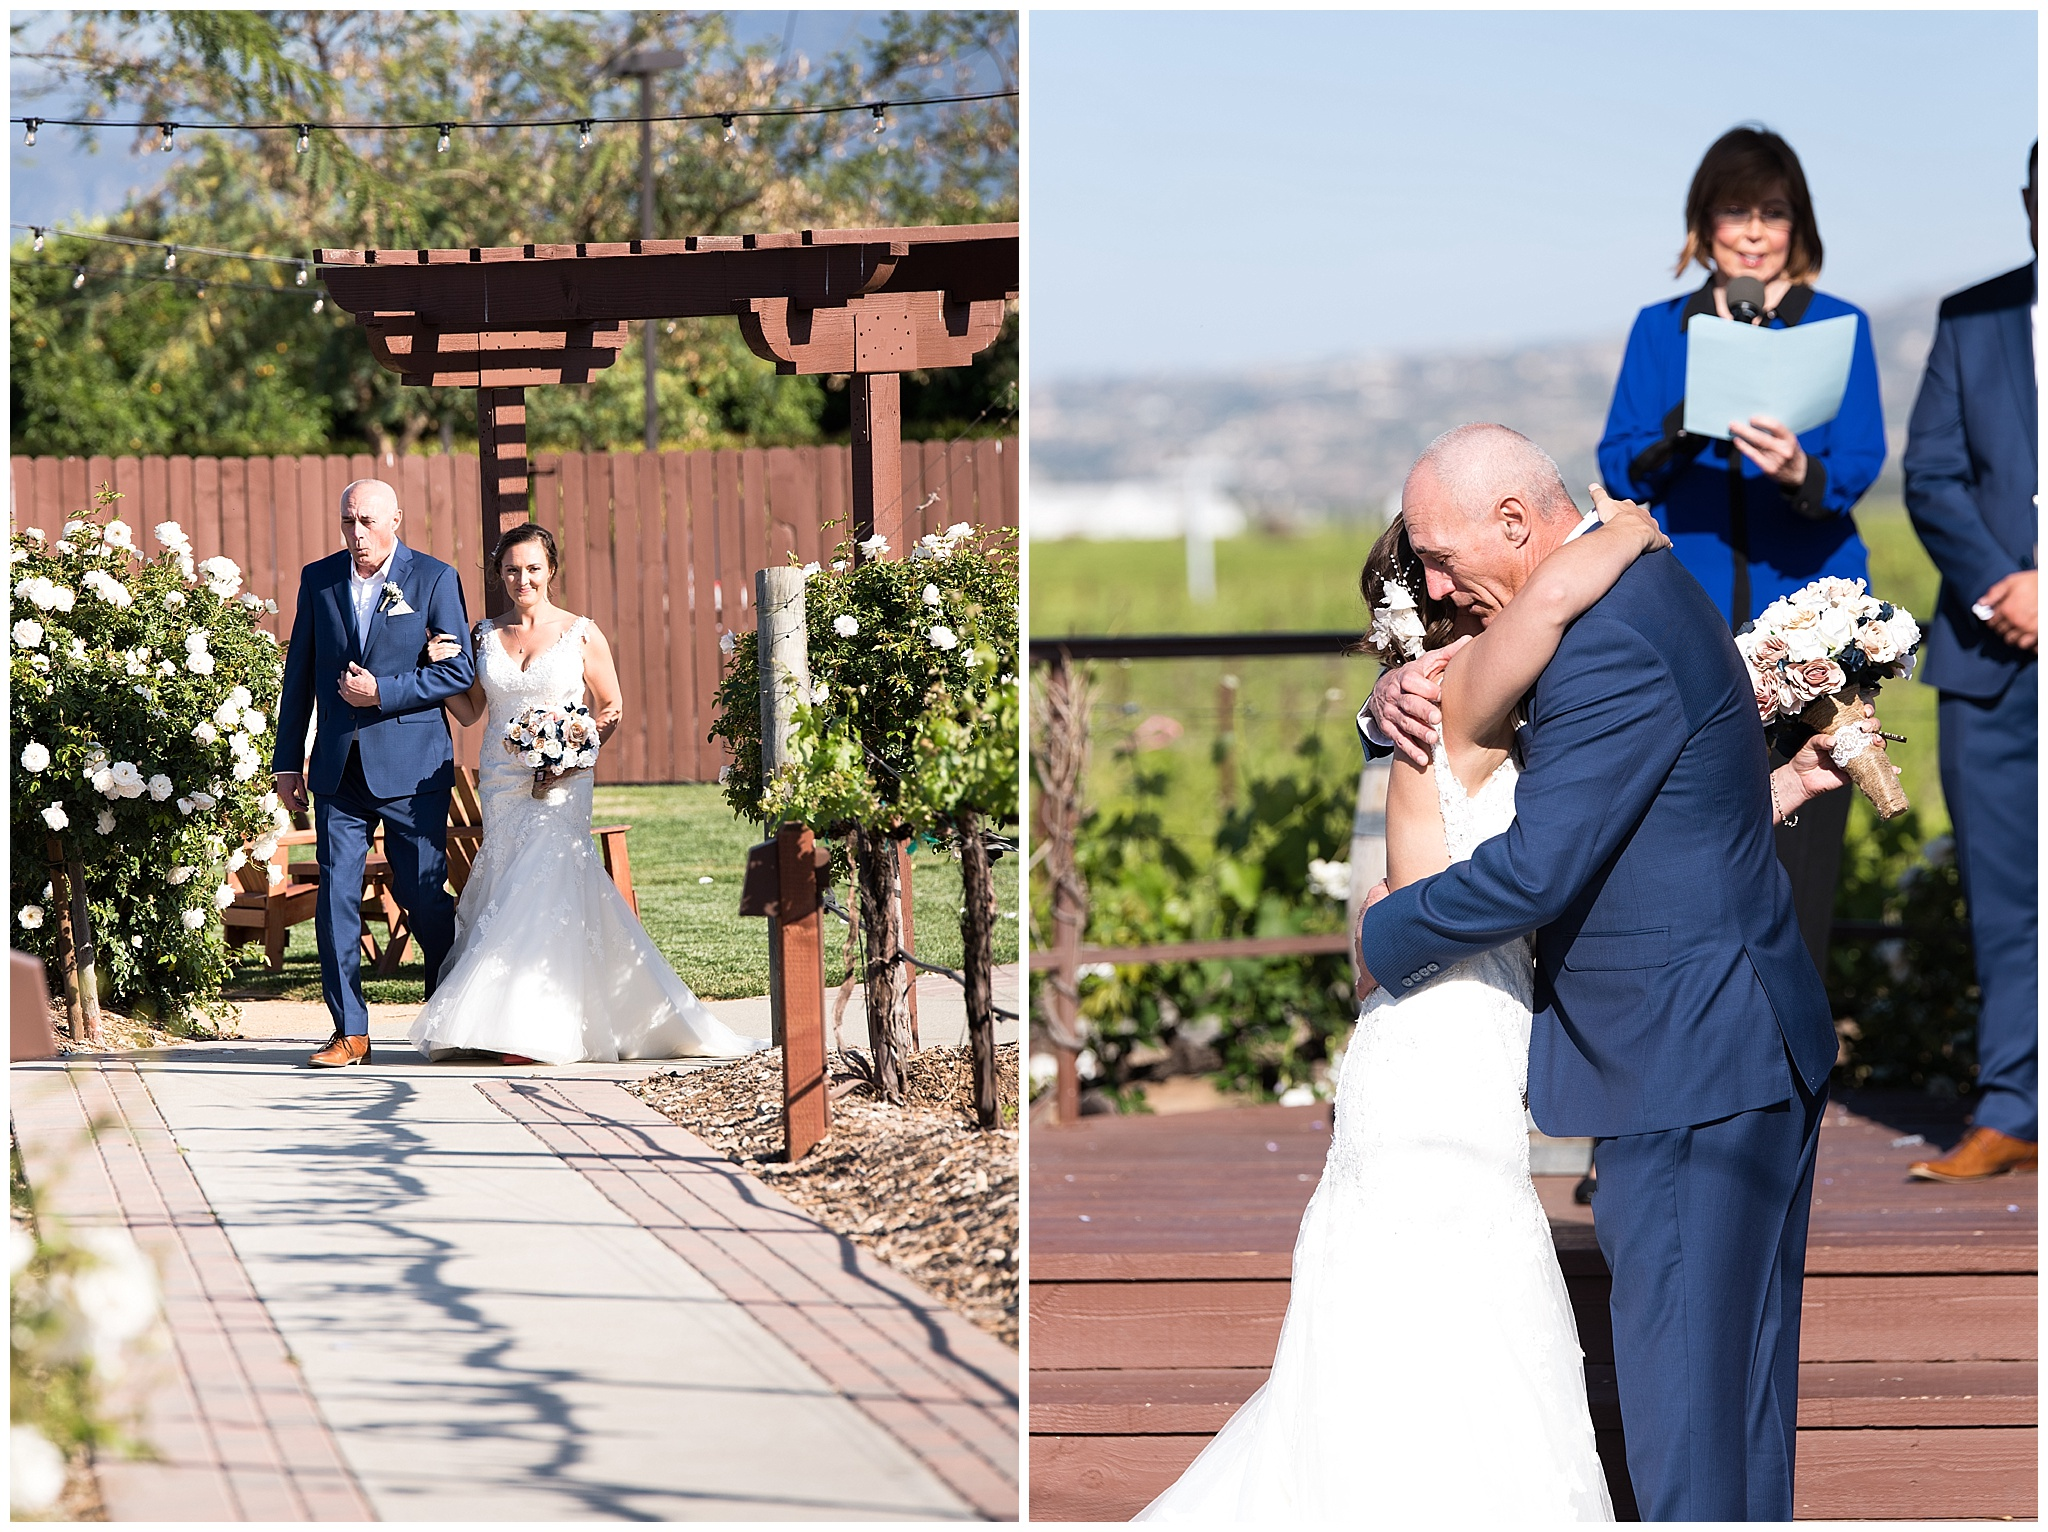 Vinny-Cayt-Wedding-4-26-18-2256.jpg